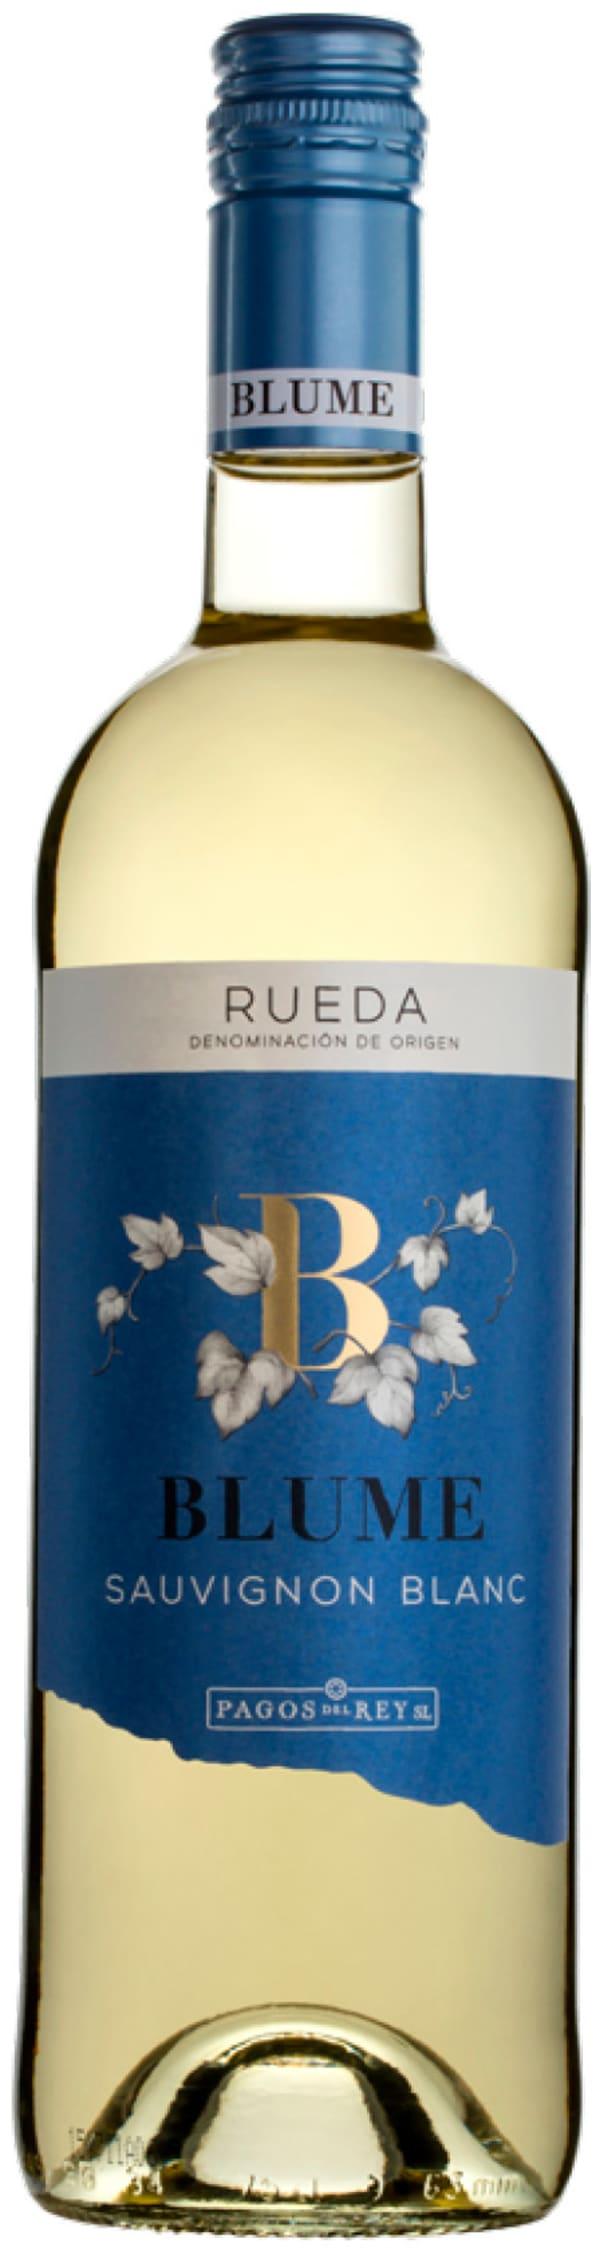 Pagos Del Rey Blume Sauvignon Blanc